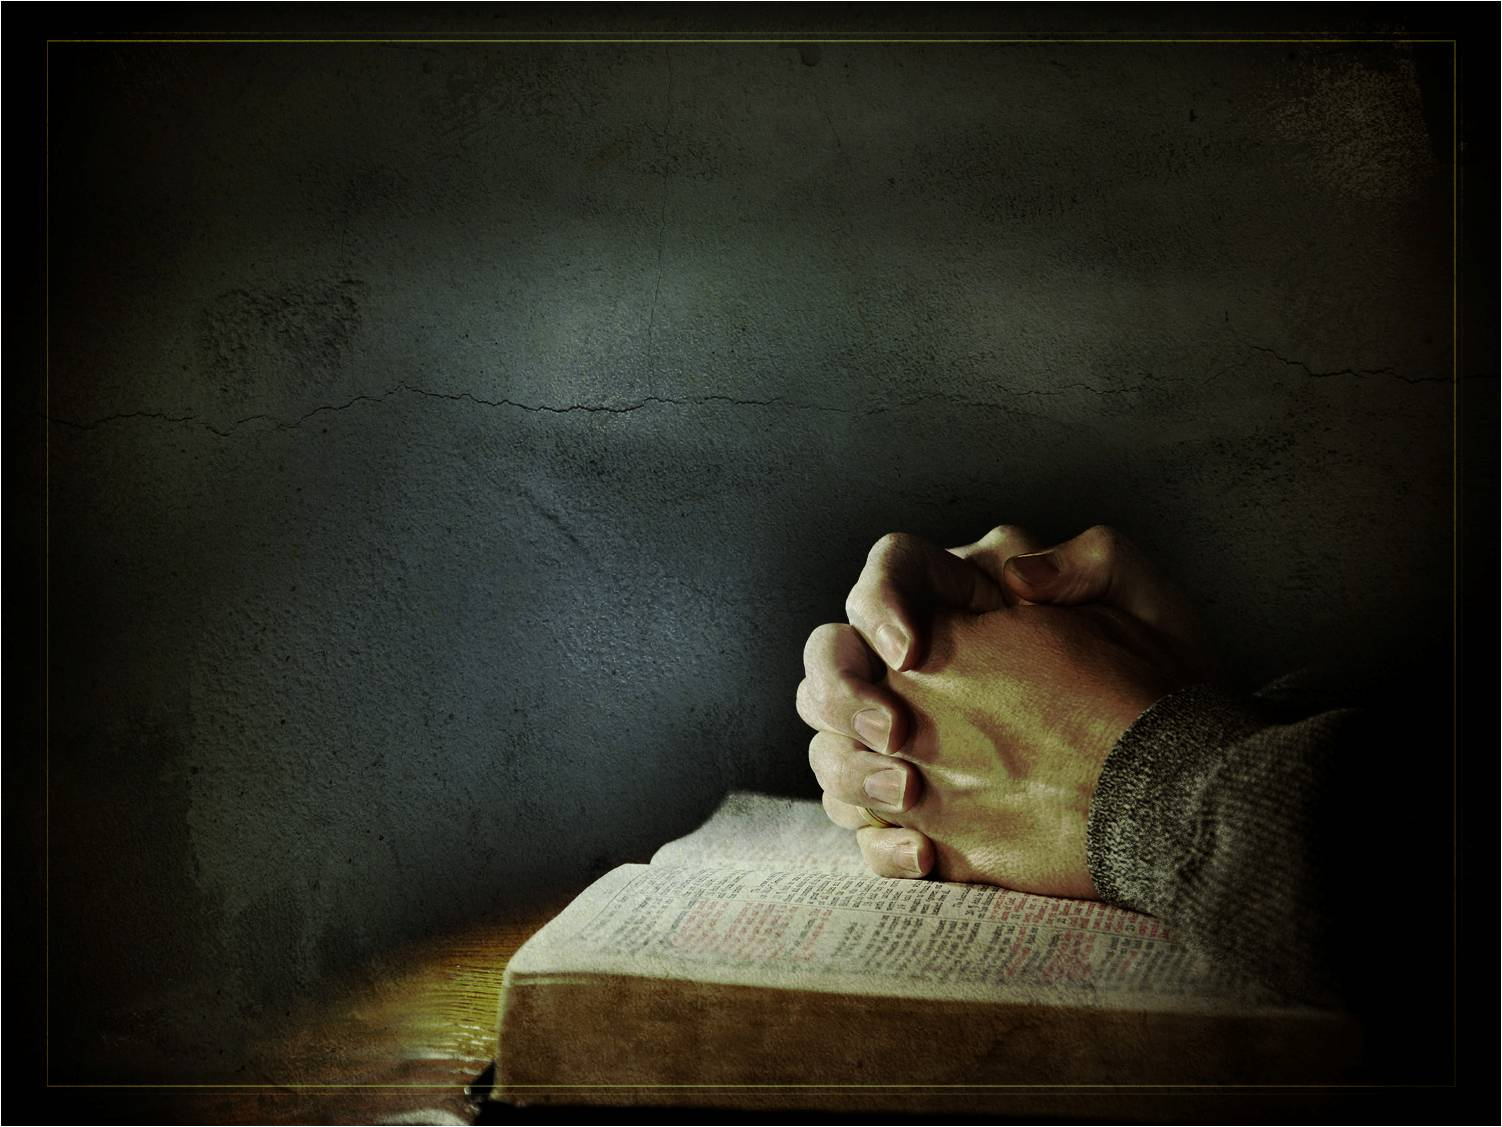 discipline-of-prayer-the